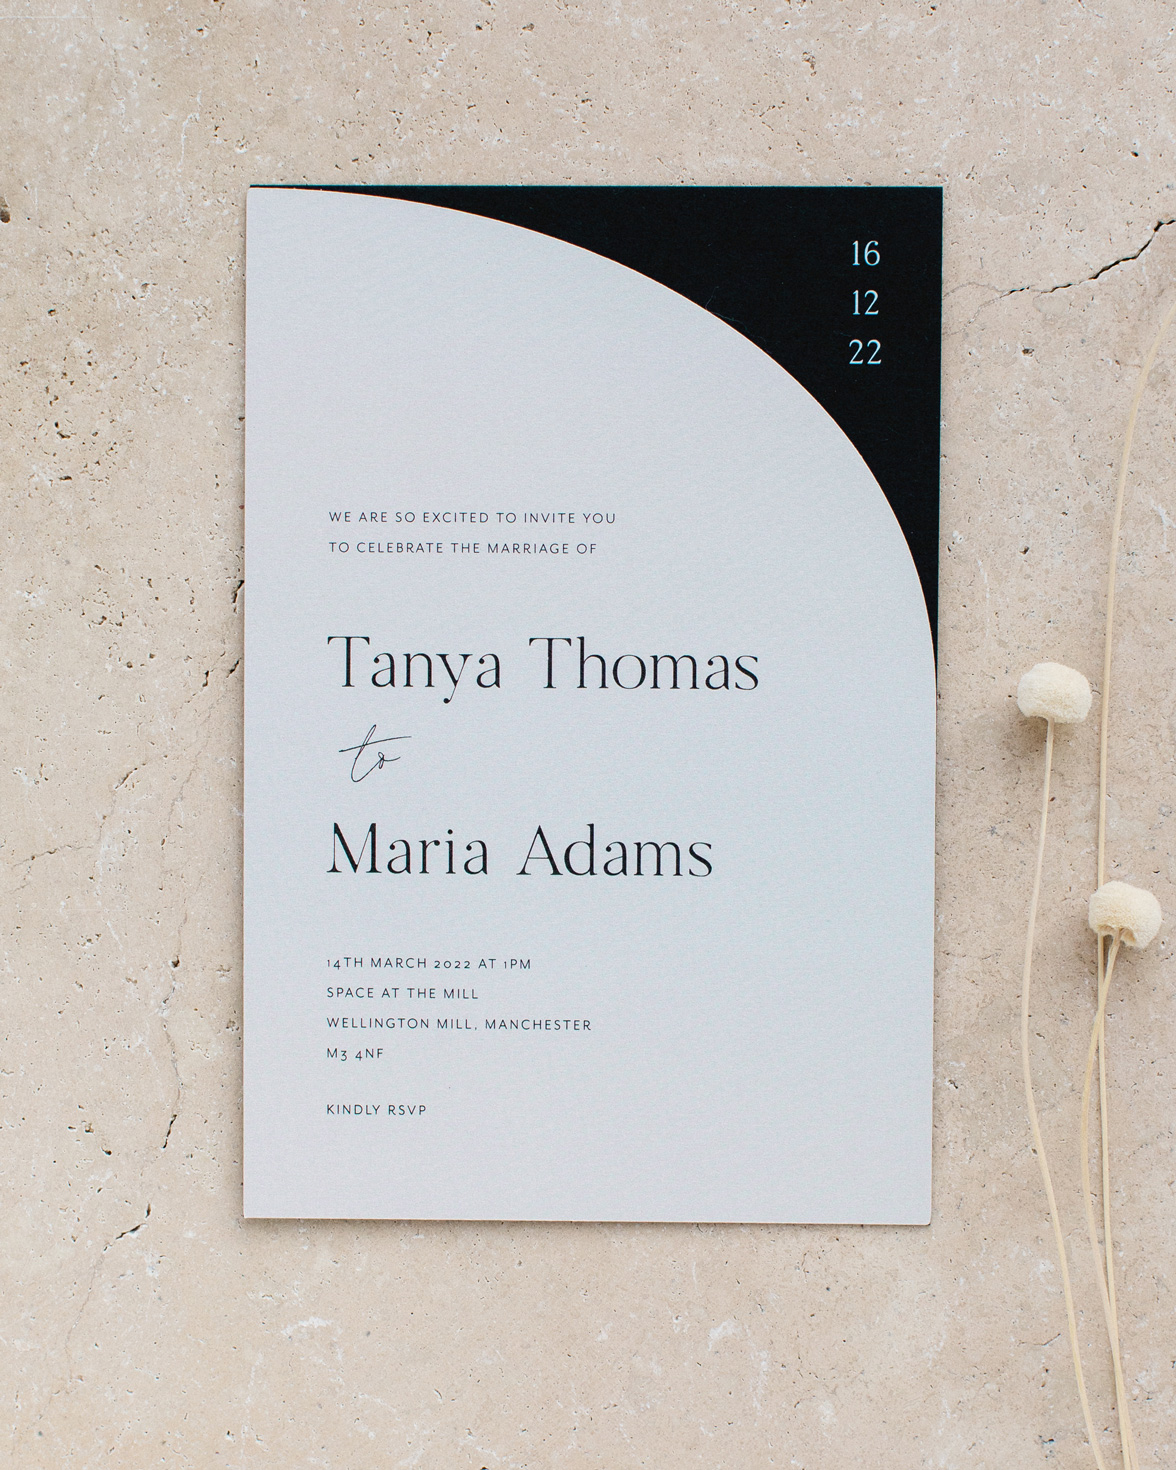 Half Arch die cut wedding invitation and details card